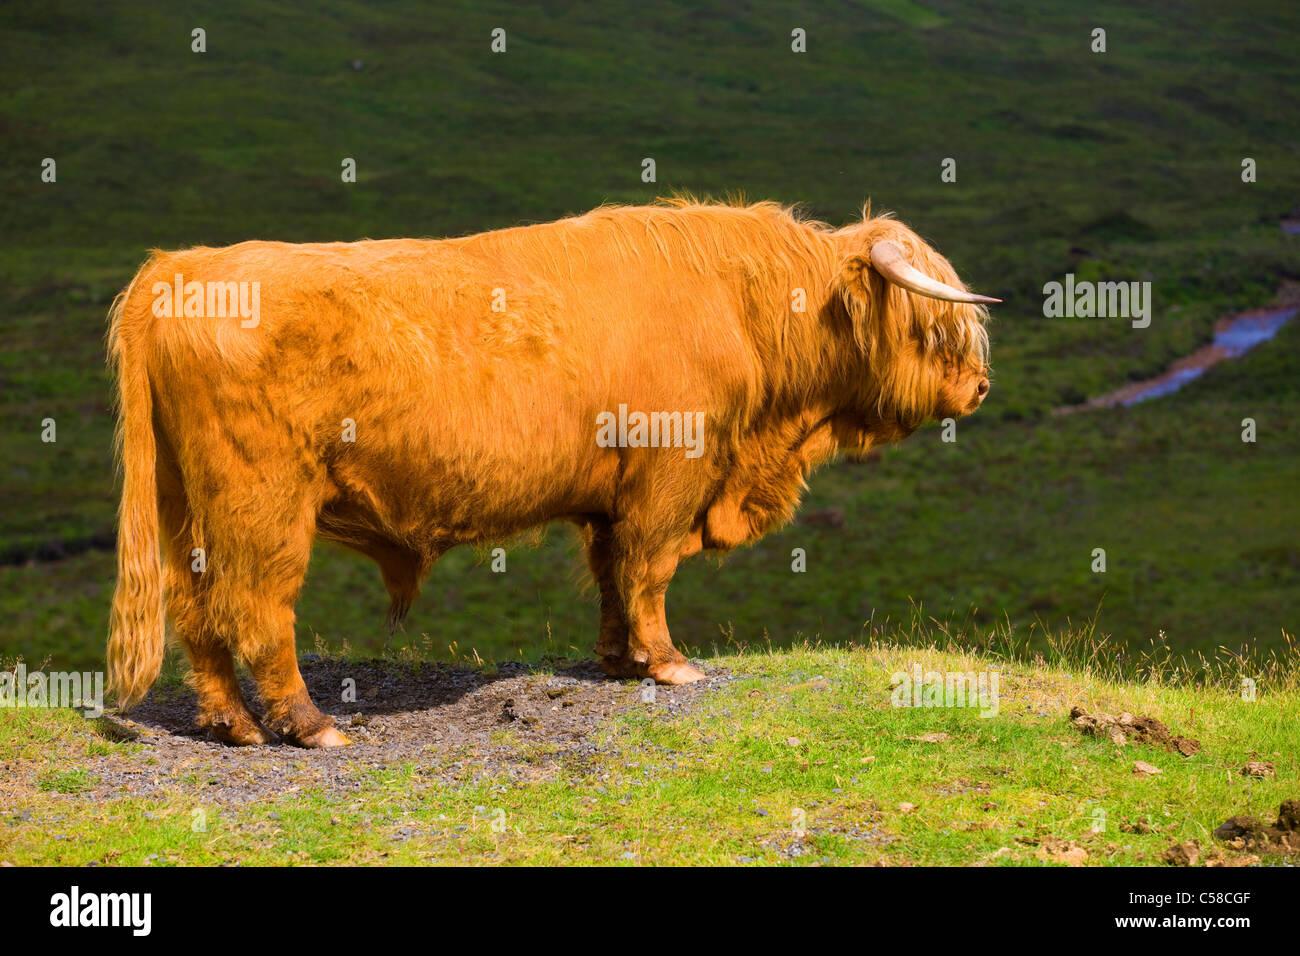 Sconser, highland bovine animal, Great Britain, Scotland, Europe, mammal, domestic animal, pet, Scottish highland - Stock Image